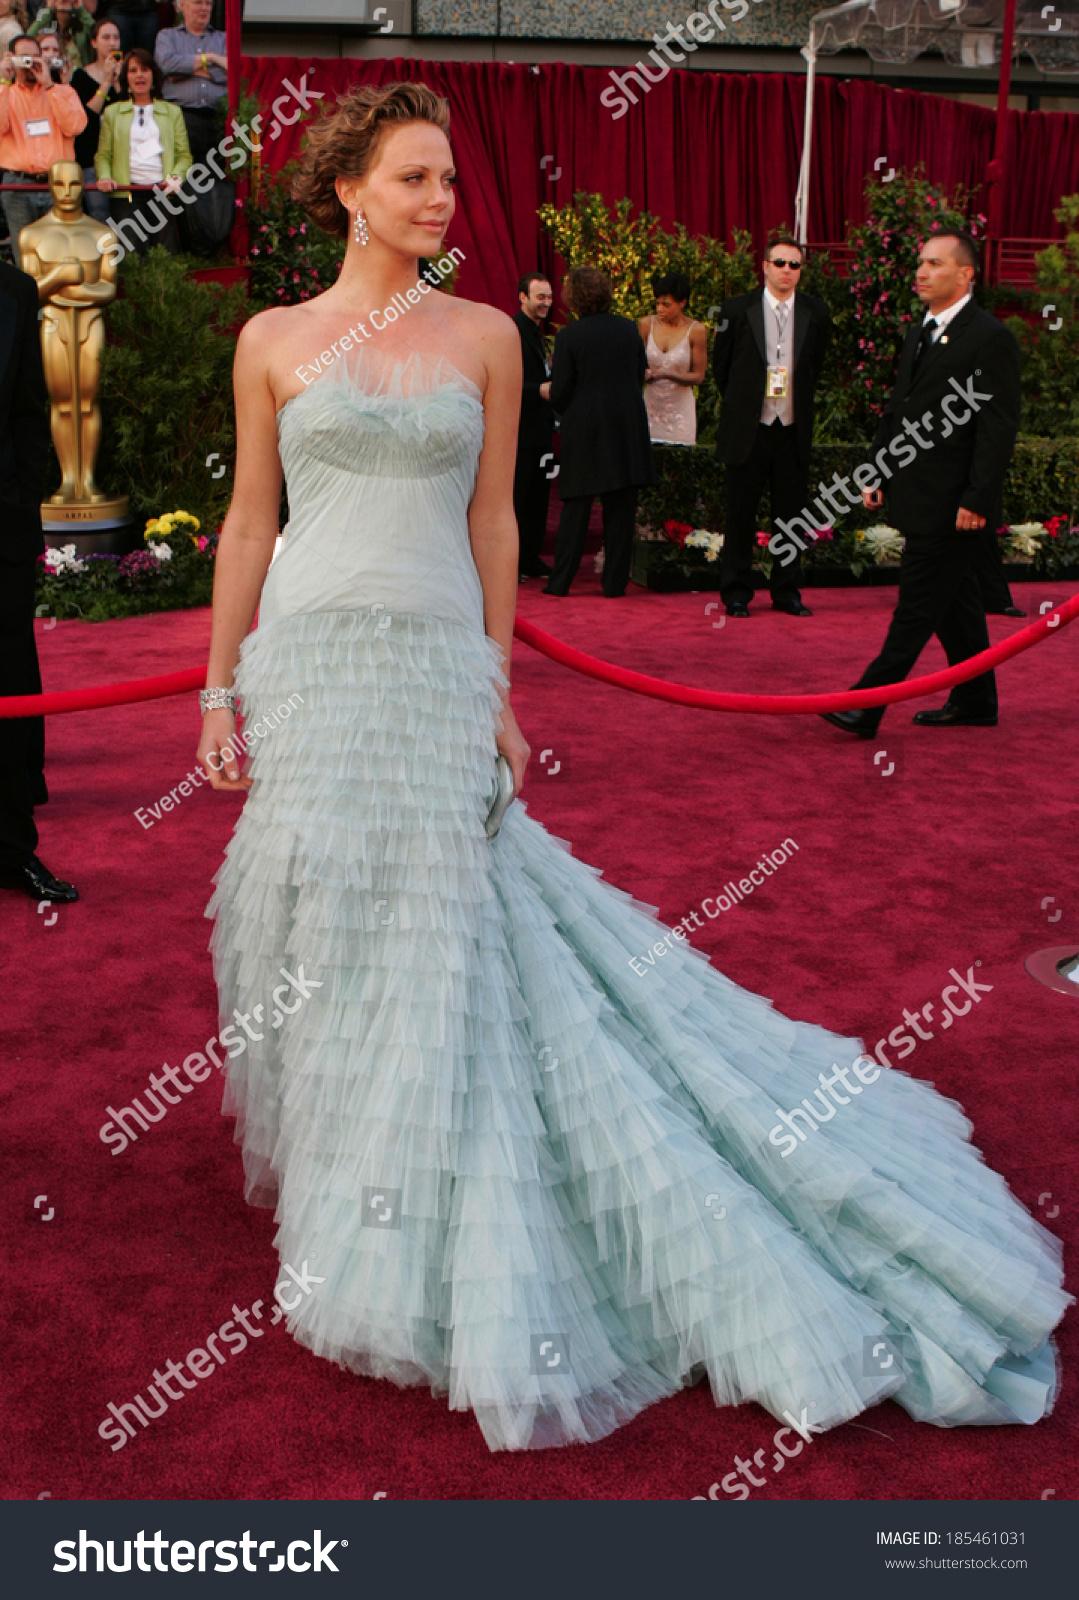 Charlize Theron John Galliano Dior Dress Stock Photo (Royalty Free ...